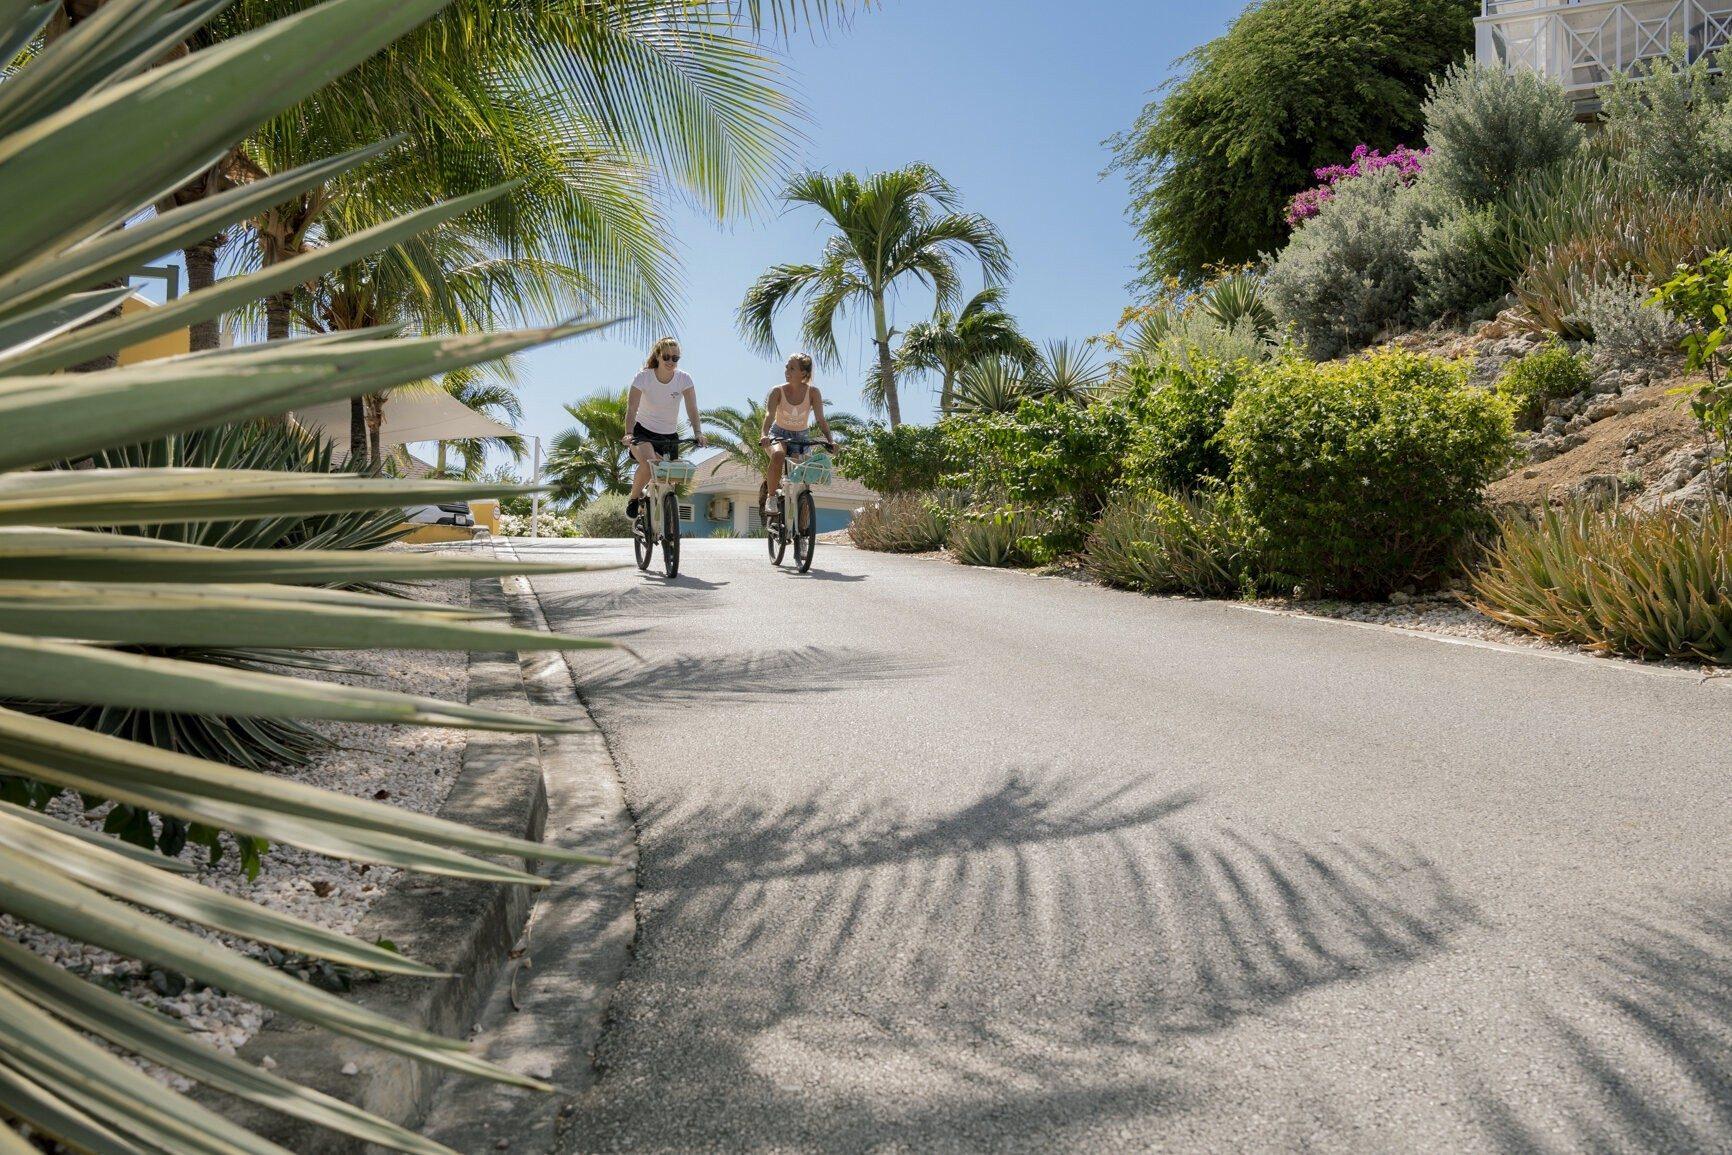 2 female tourists enjoying their time on the Chogogo Curacao rental bikes.